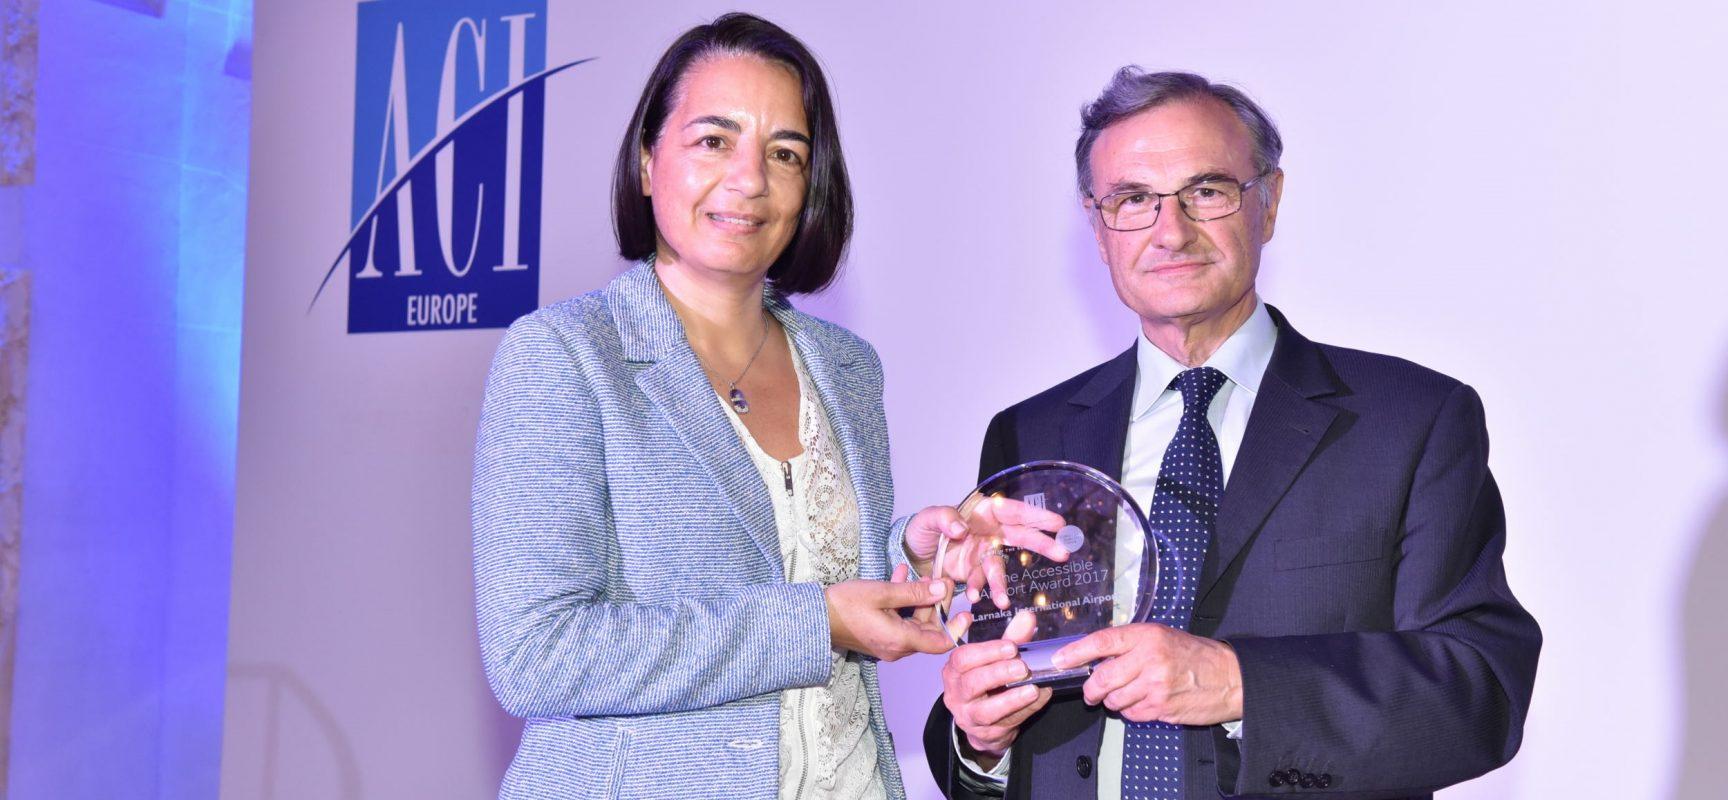 Aeroporto di Napoli vince ACI Europe AWard